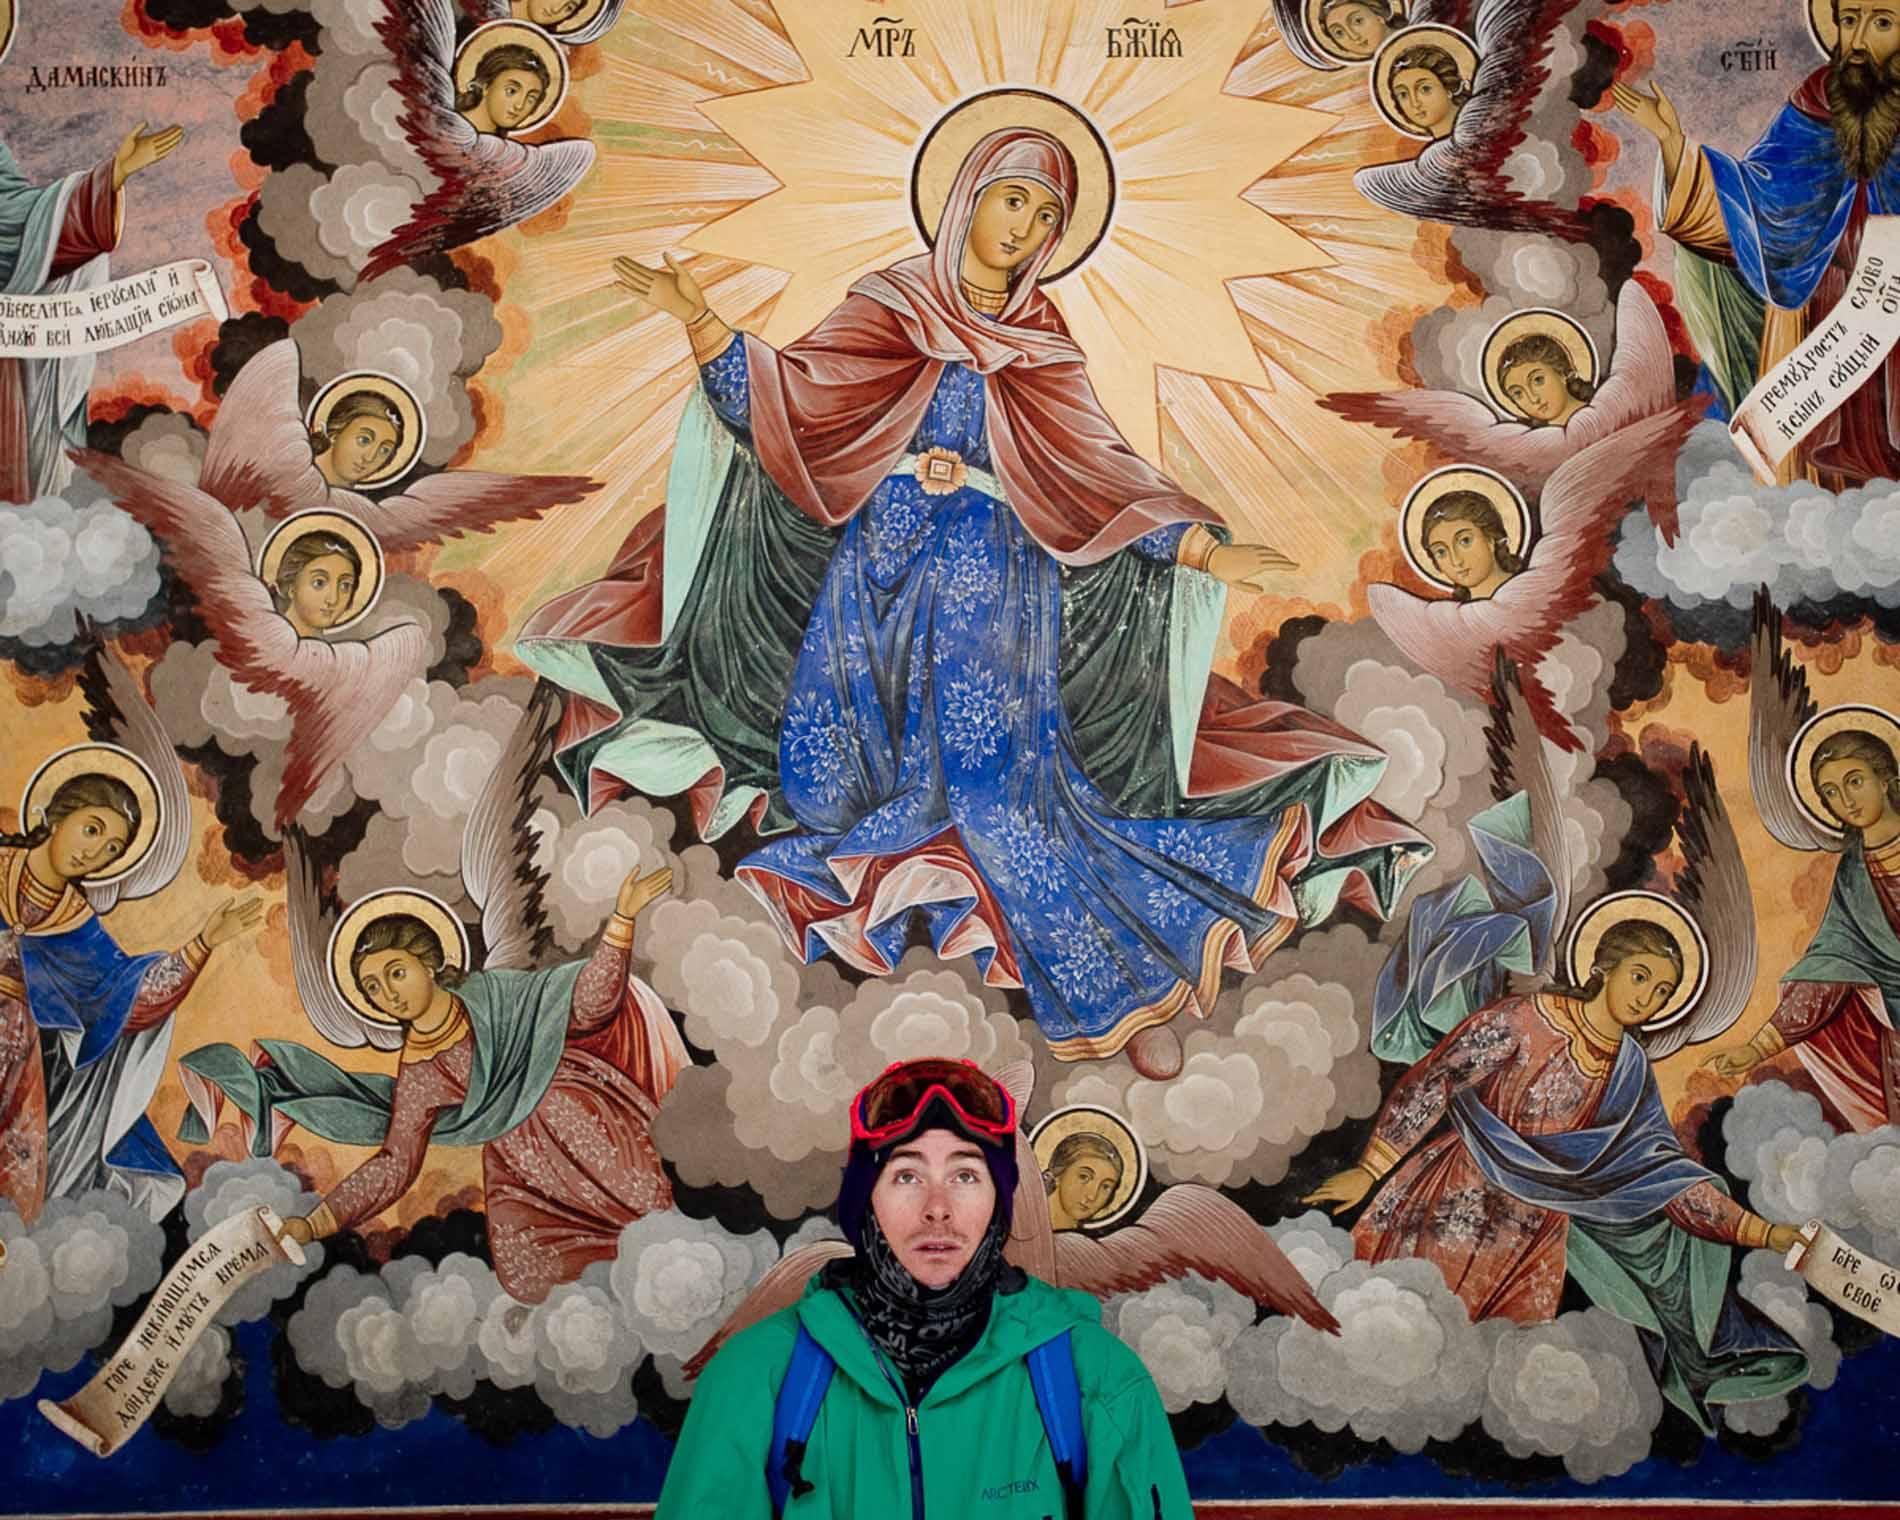 Forrest Coots. Rila Monastery, Bulgaria